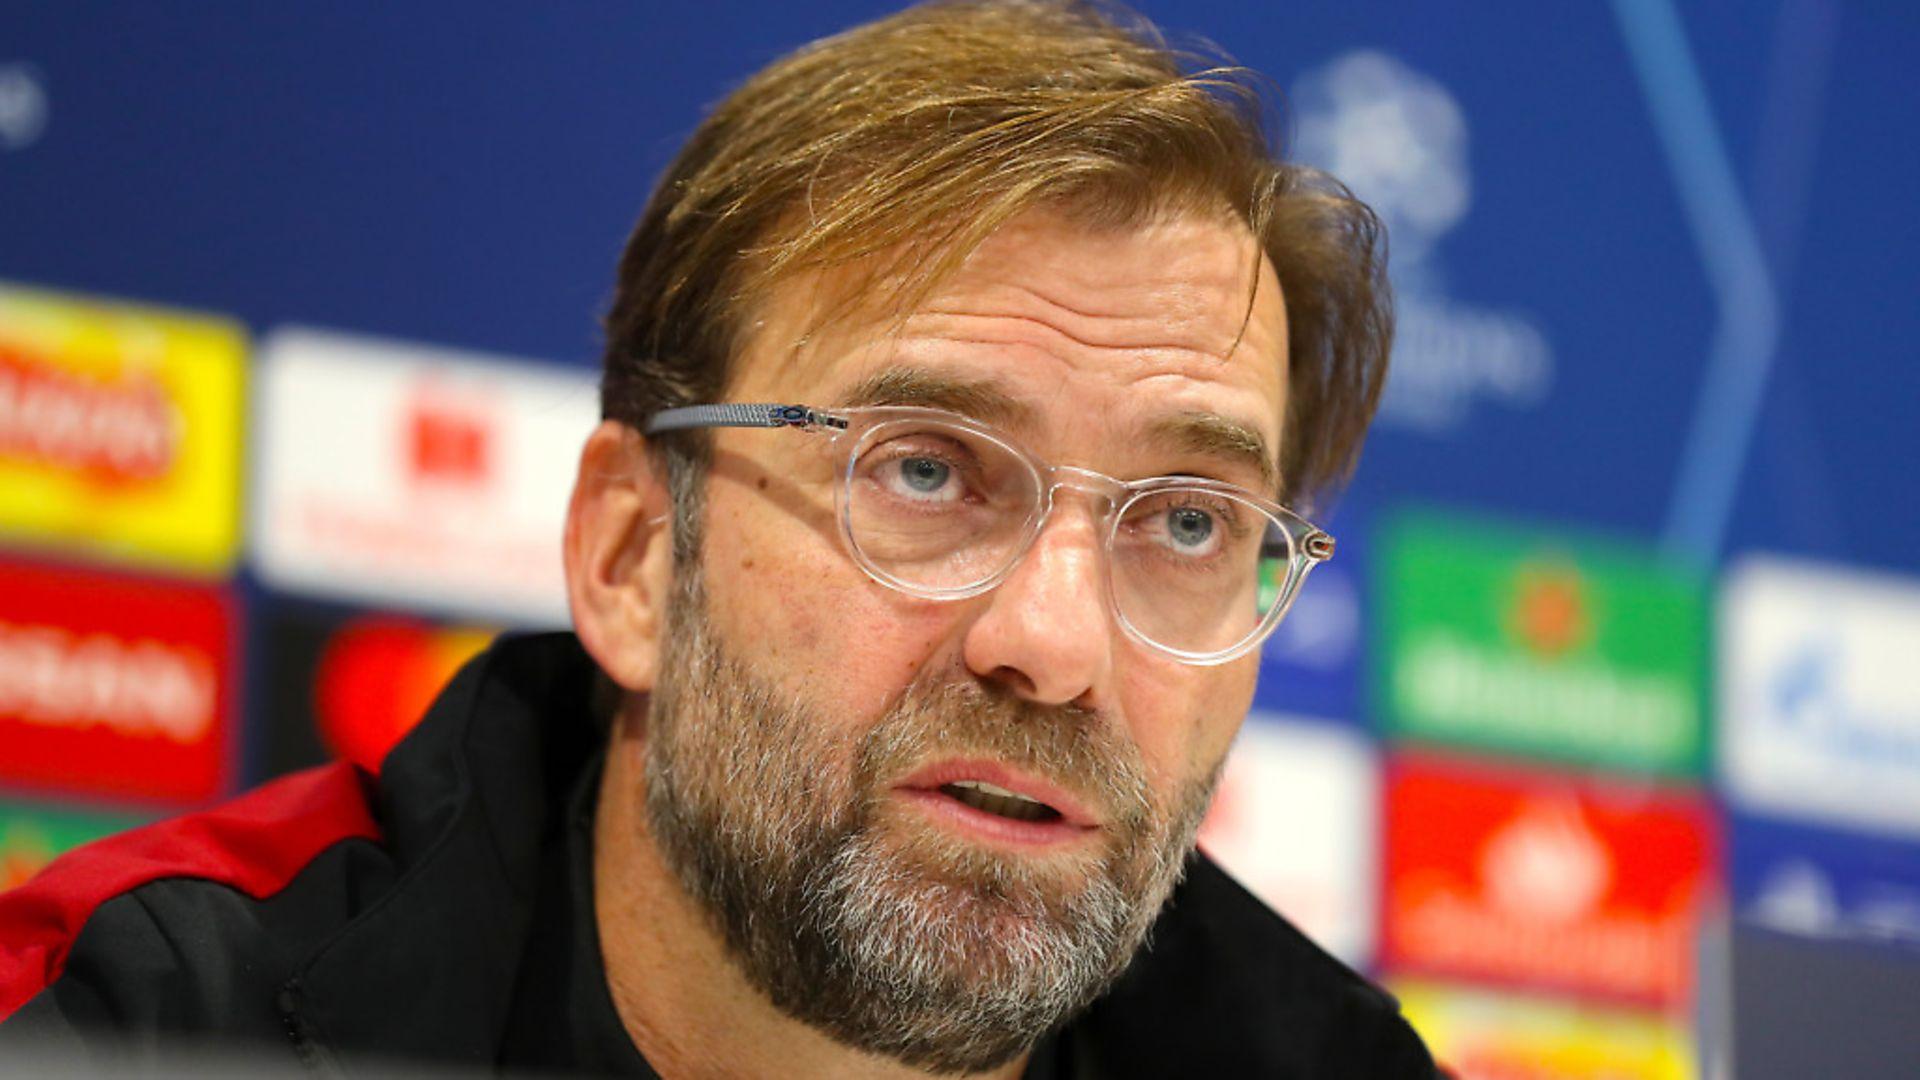 Liverpool manager Jurgen Klopp. Photograph: Martin Rickett/PA. - Credit: PA Wire/PA Images